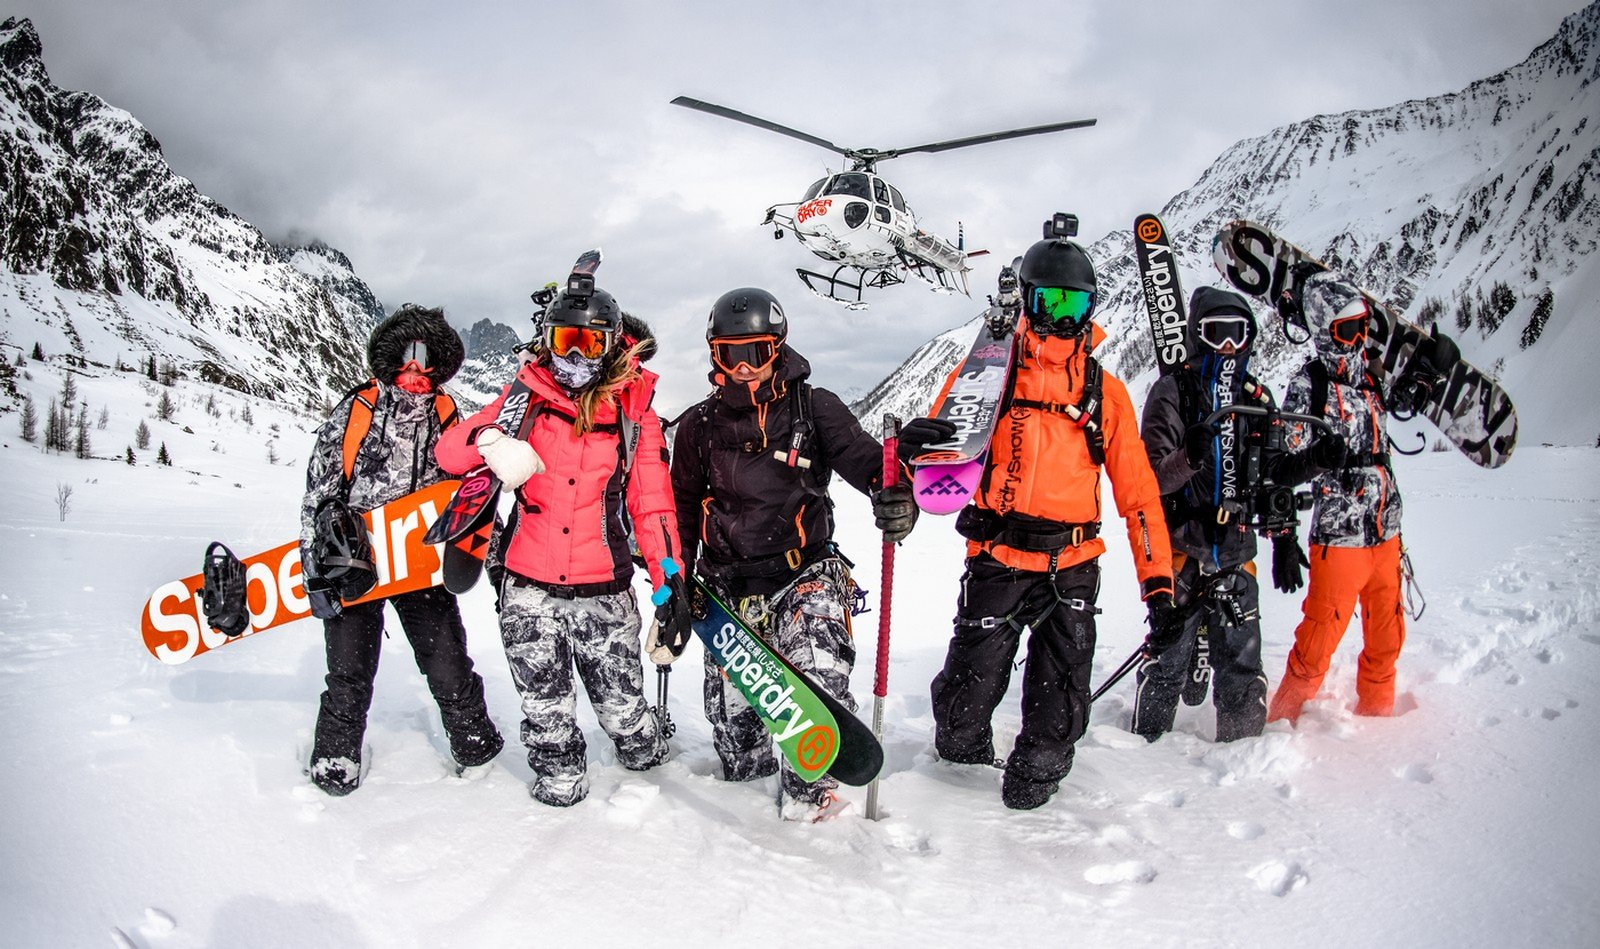 Vêtement Ski Superdry